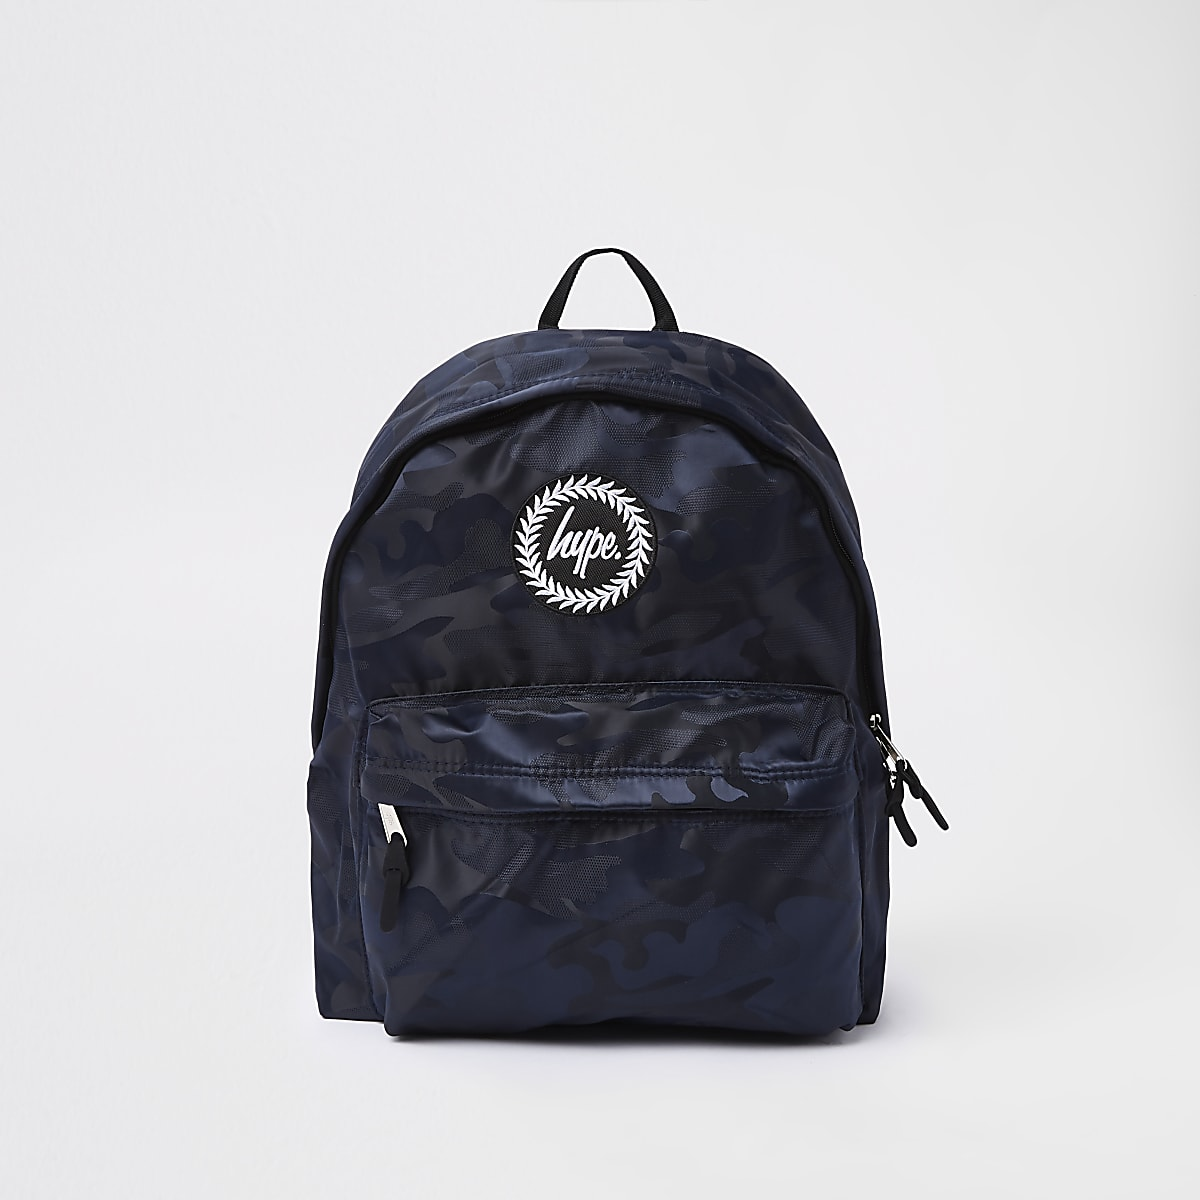 Hype black camo backpack